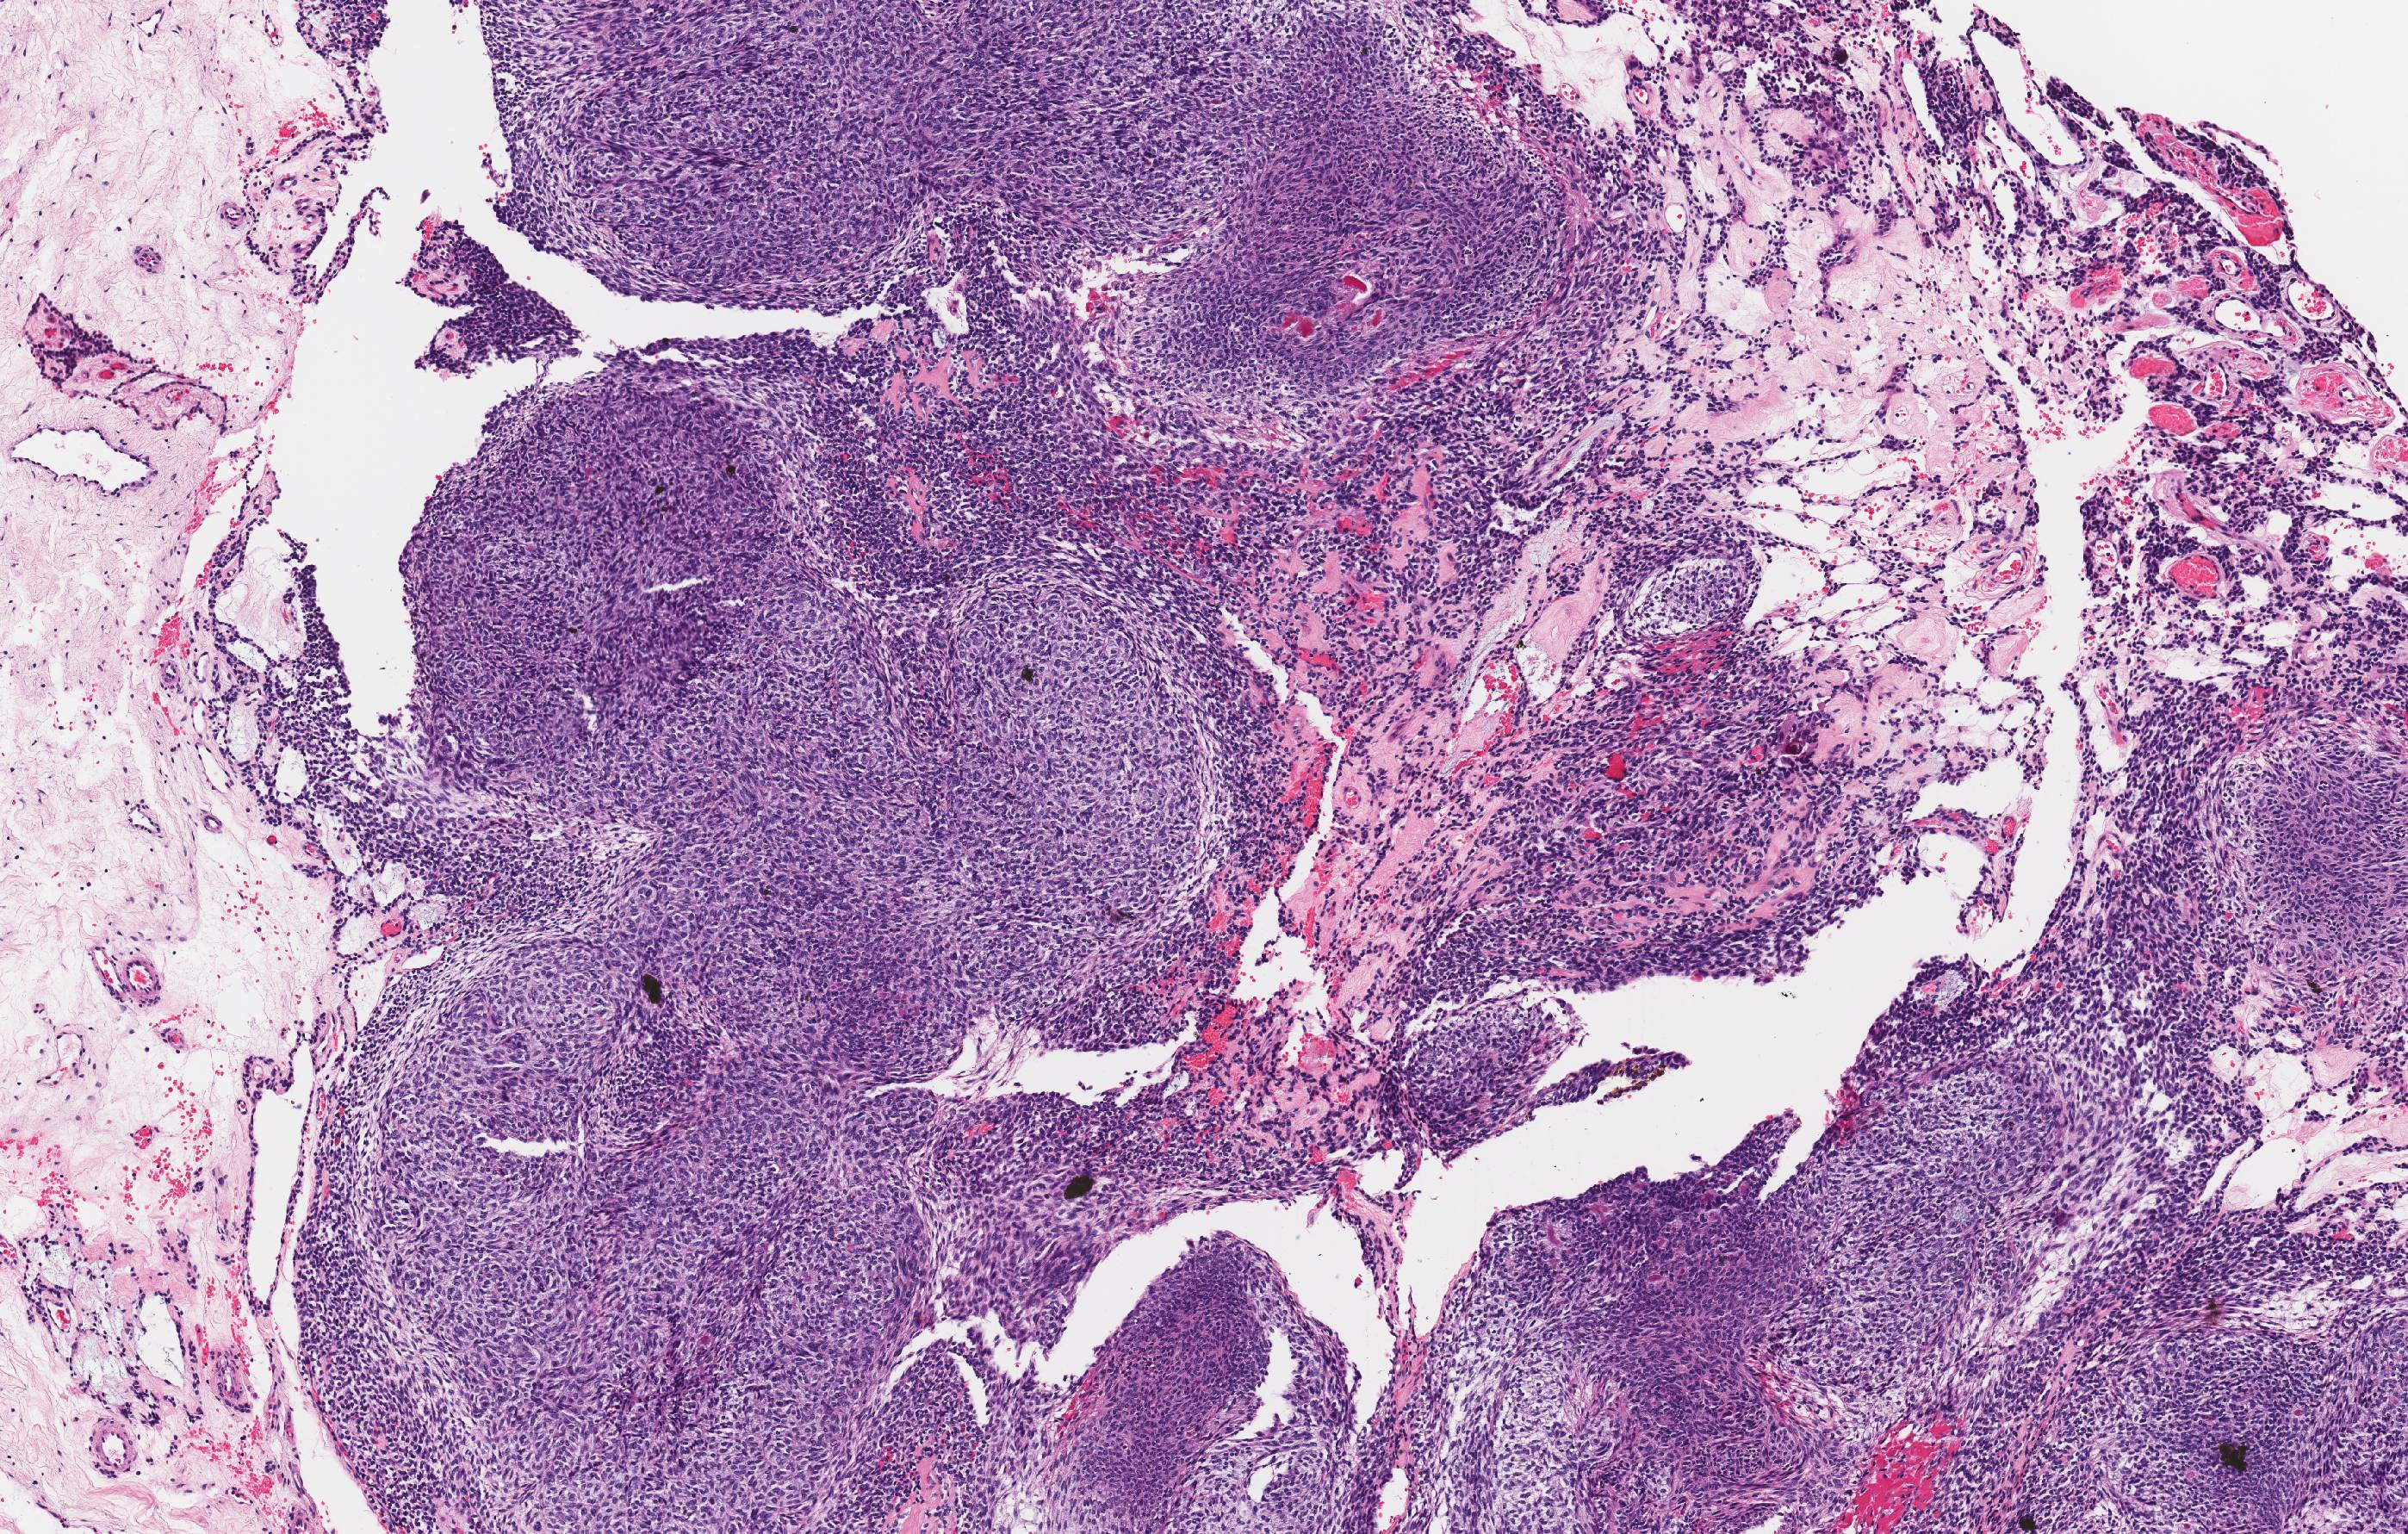 Adenomatoid odontogenic tumor